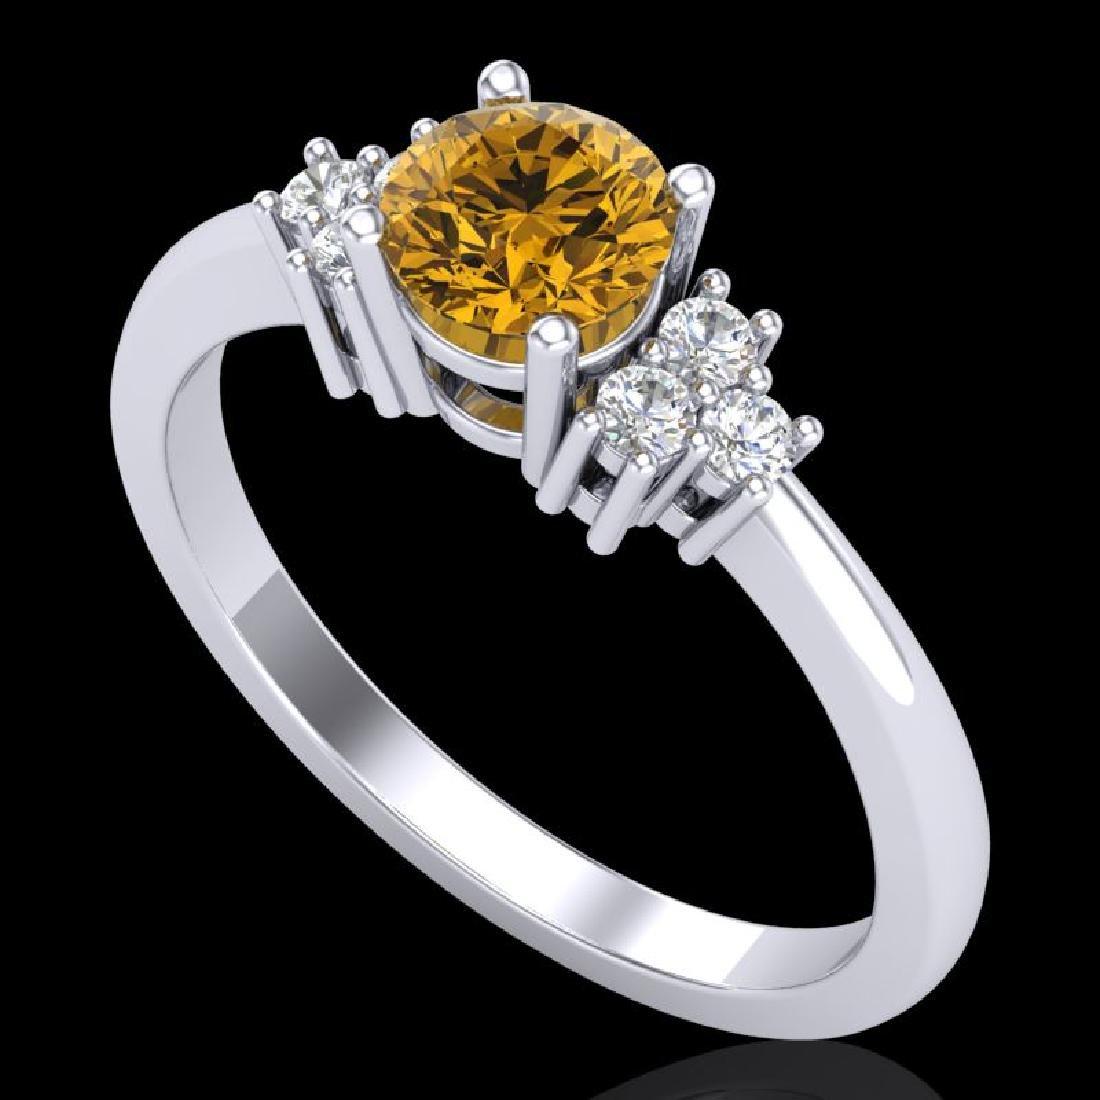 0.75 CTW Intense Fancy Yellow Diamond Engagement